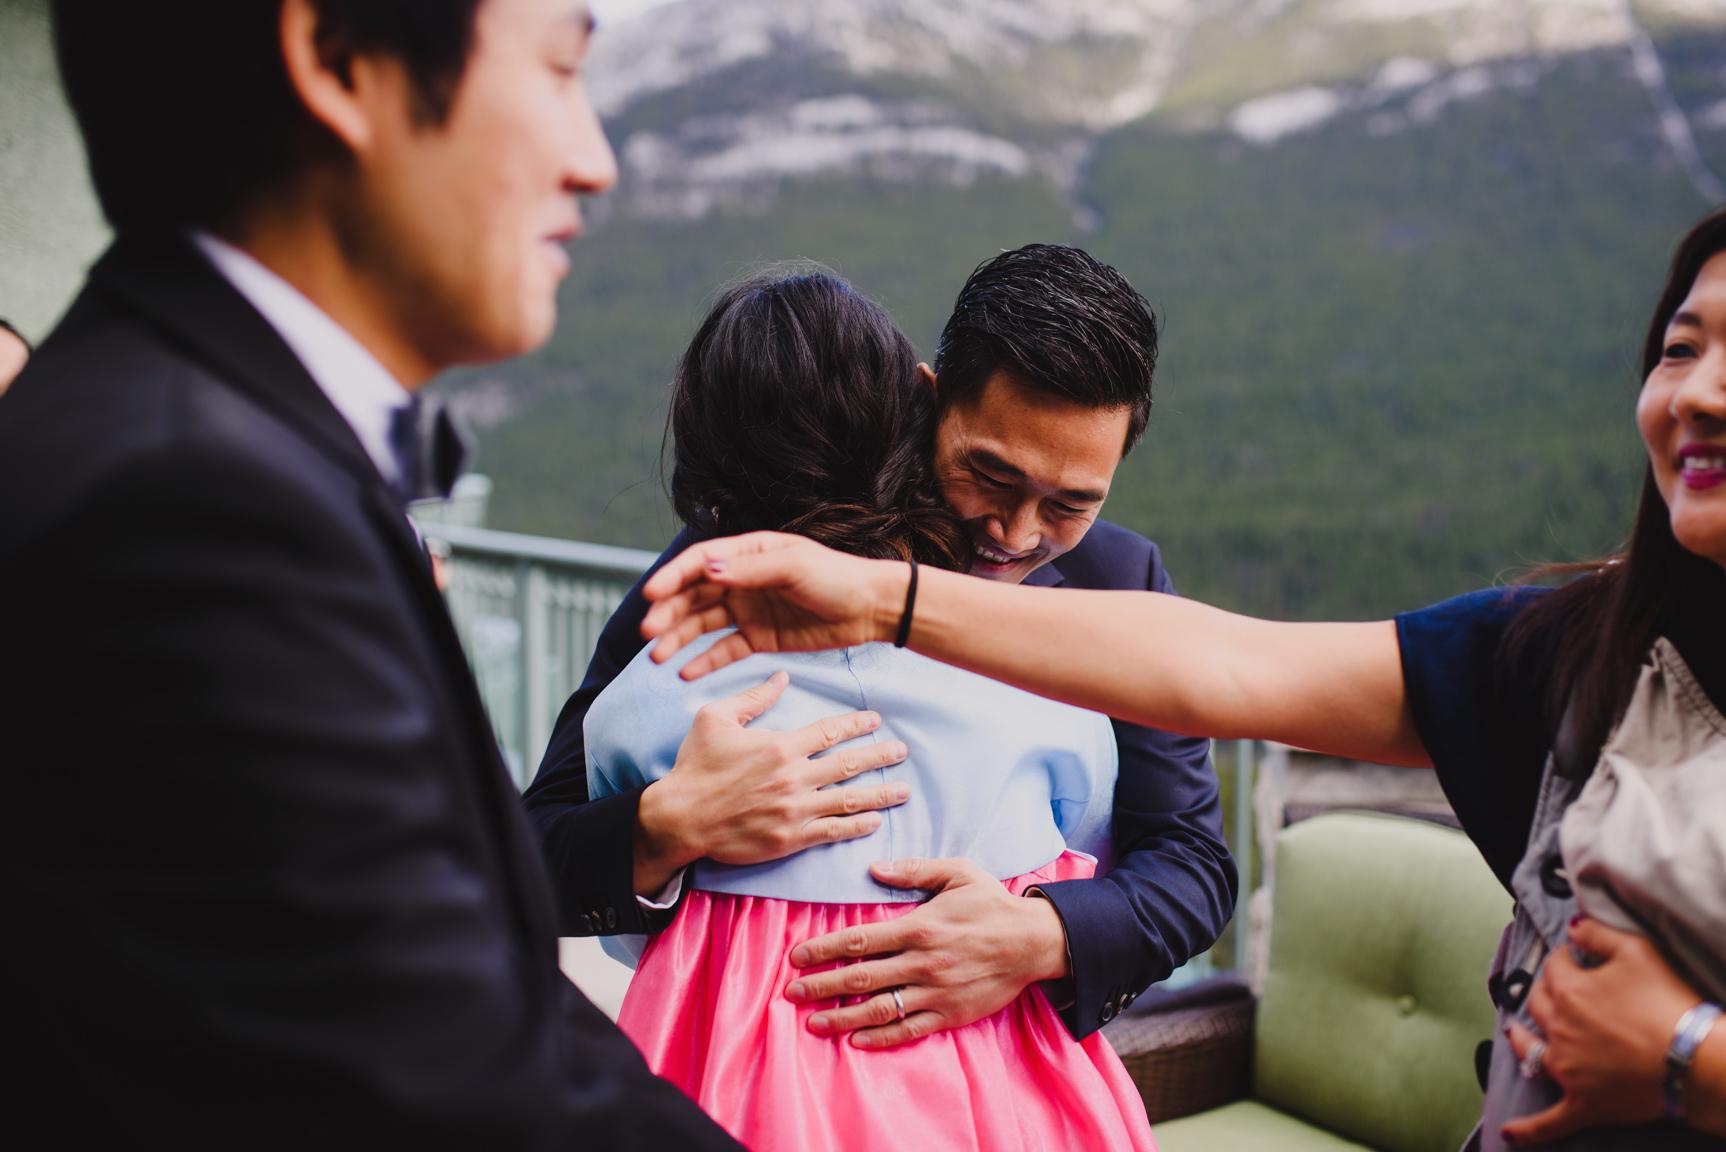 Banff-Wedding-Photography-MichaelChanPhotography24.JPG